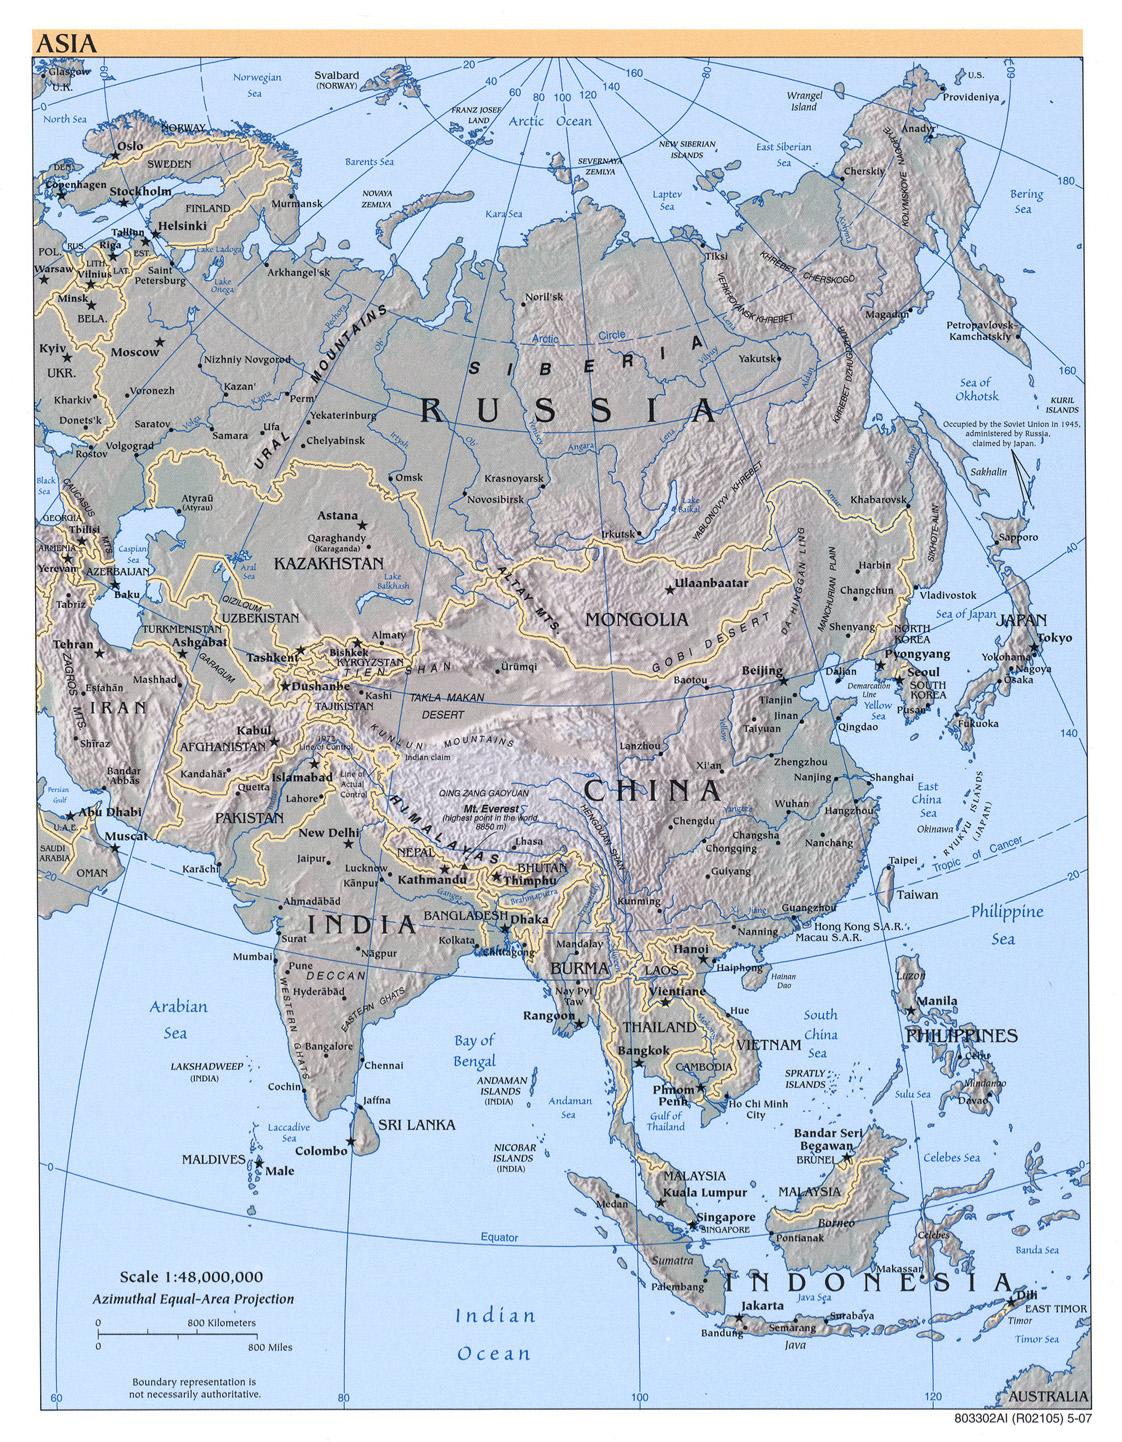 Download Free Russia Maps on ladino map, frisian map, navajo map, sakha map, breton map, persian map, bashkortostan map, maori map, tonga map, yiddish map, igbo map, oromo map, sanskrit map, wolof map, tuva map, hawaiian map, uyghur map, malagasy map, yakut map, venda map,